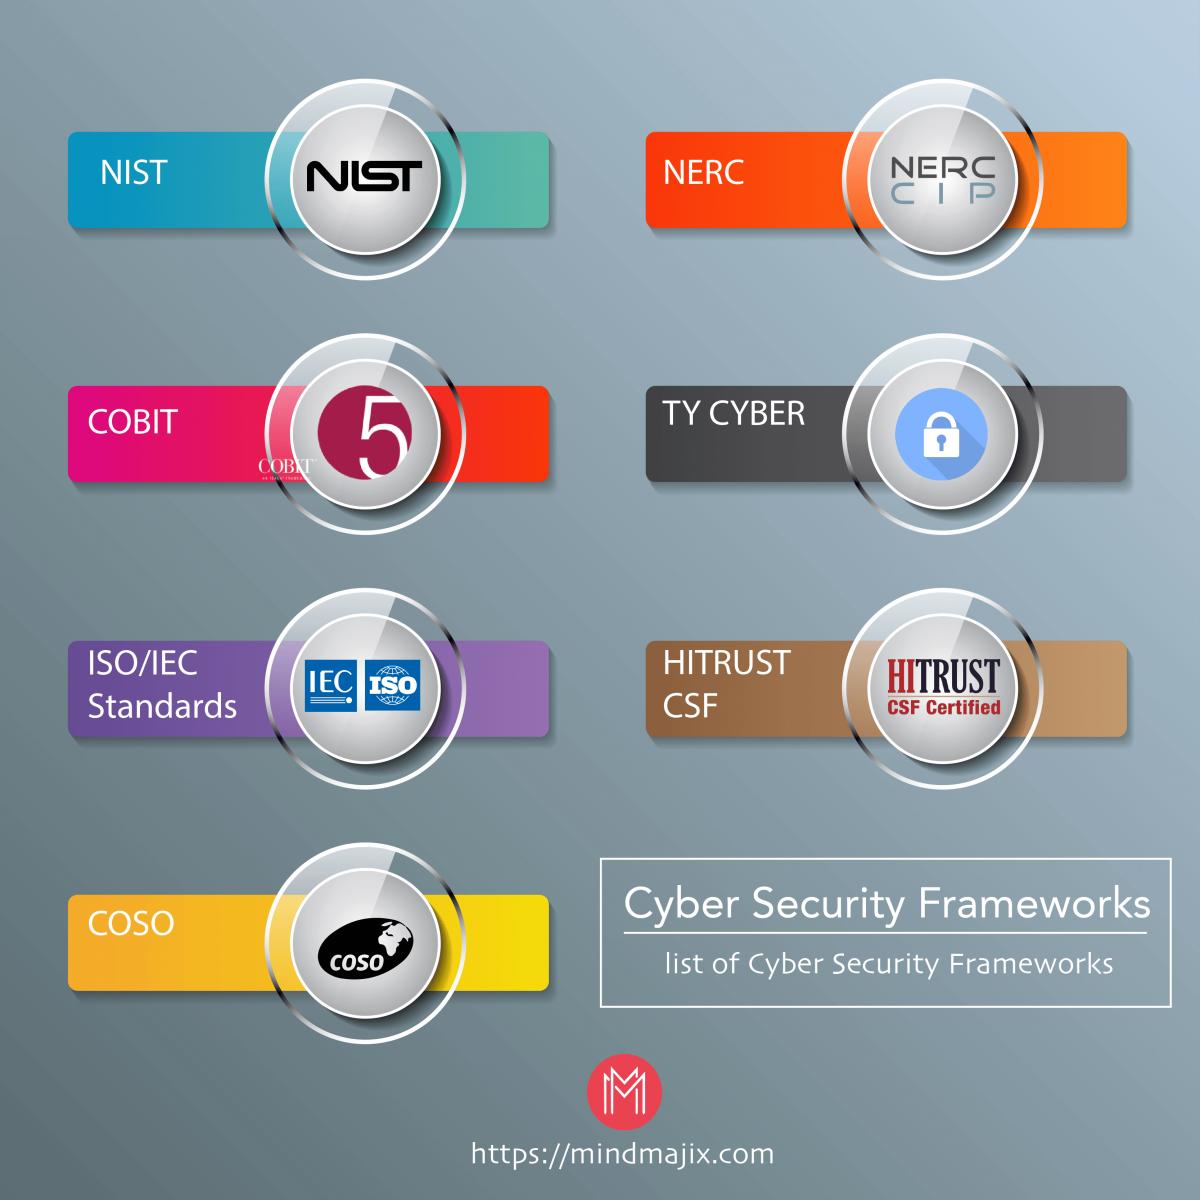 Cyber Security Frameworks